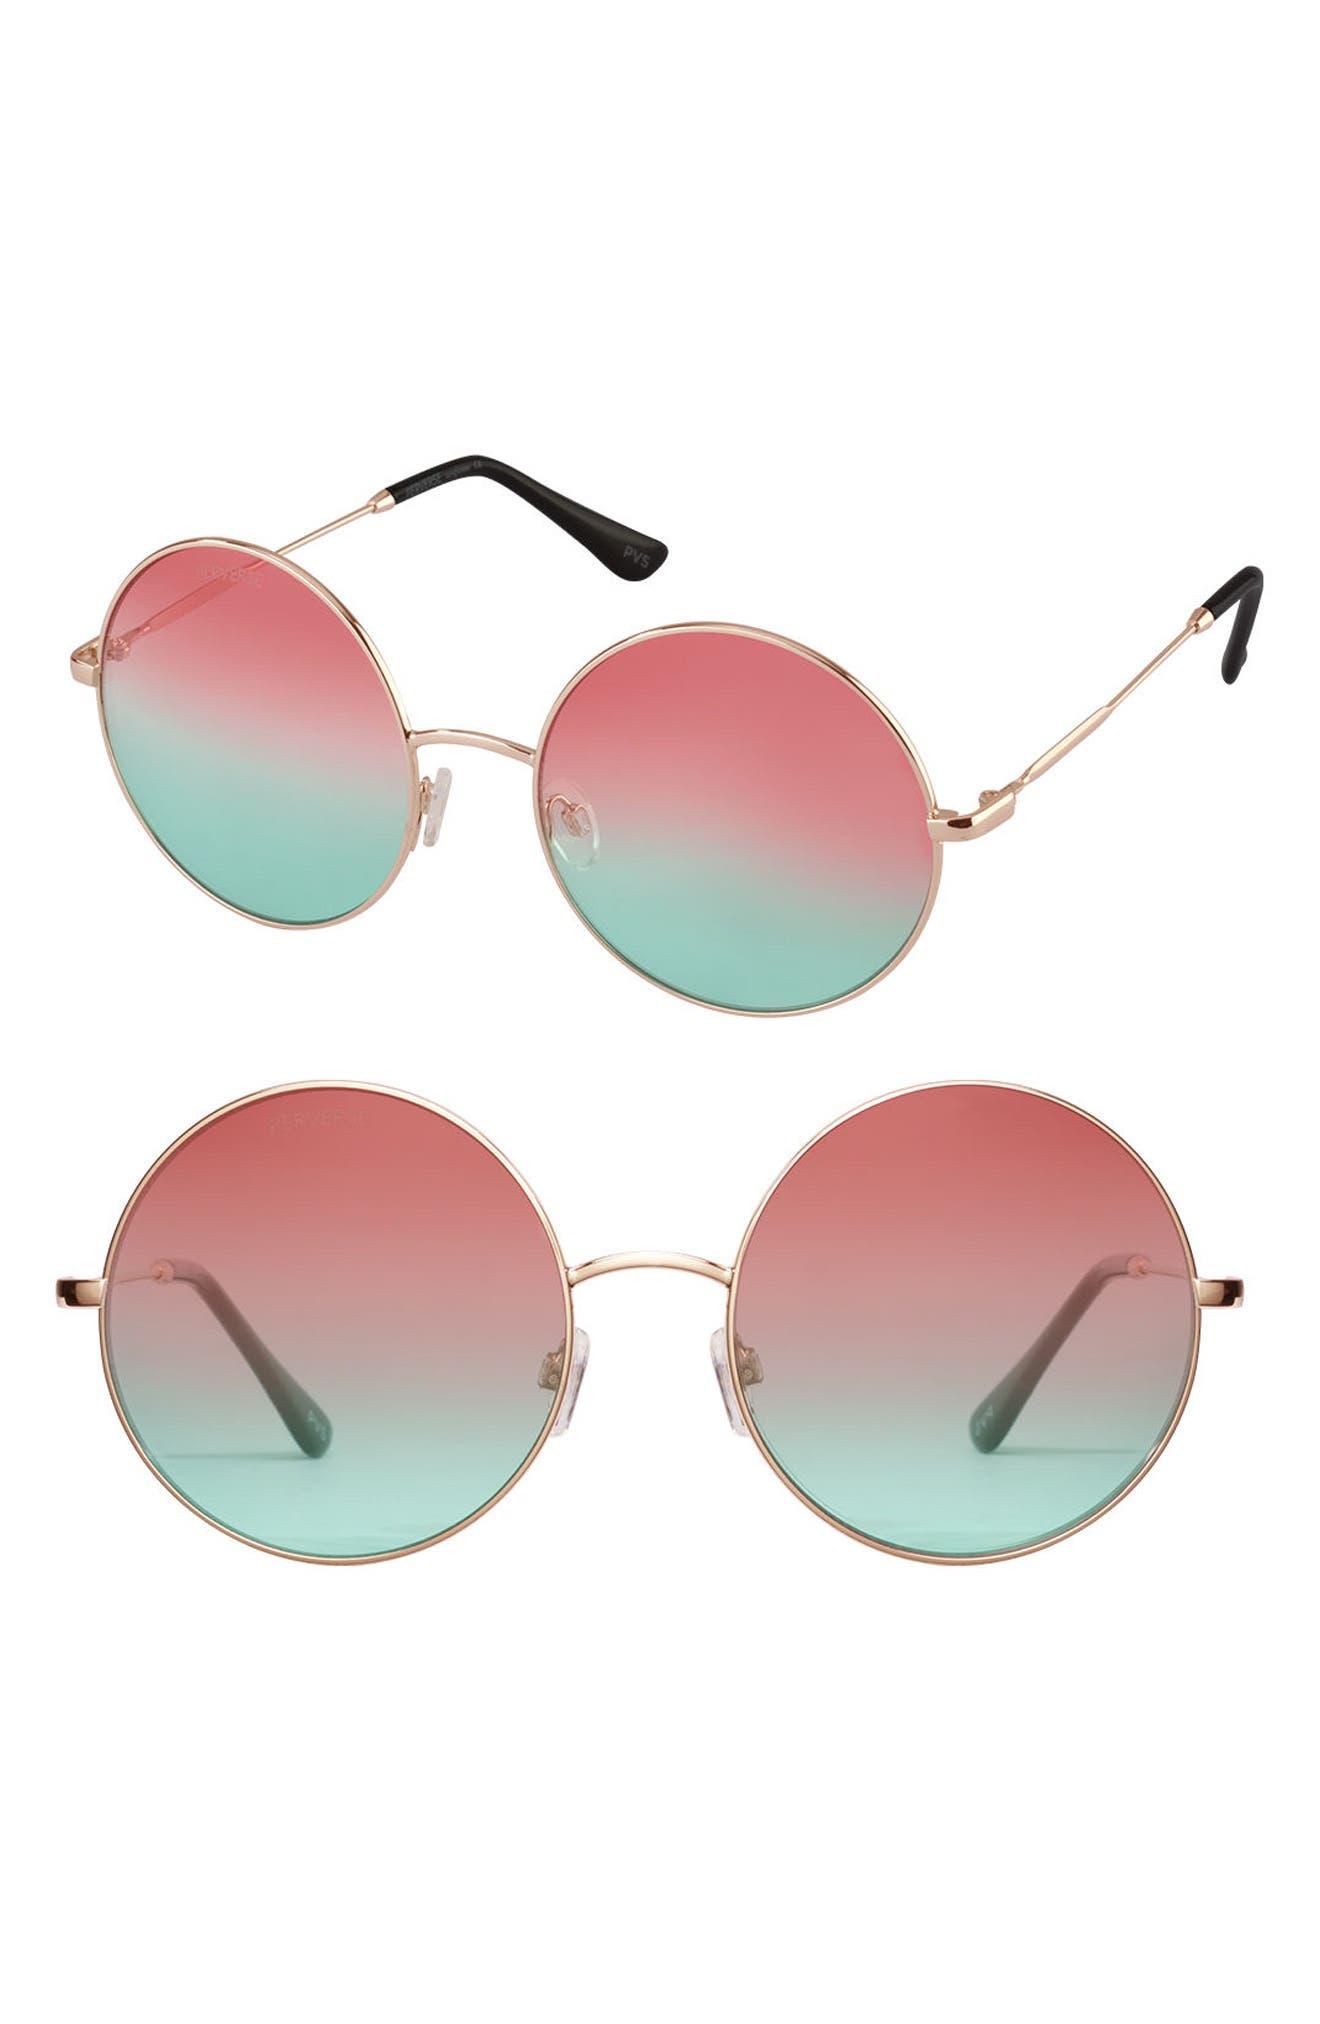 PERVERSE Half and Half Round Sunglasses